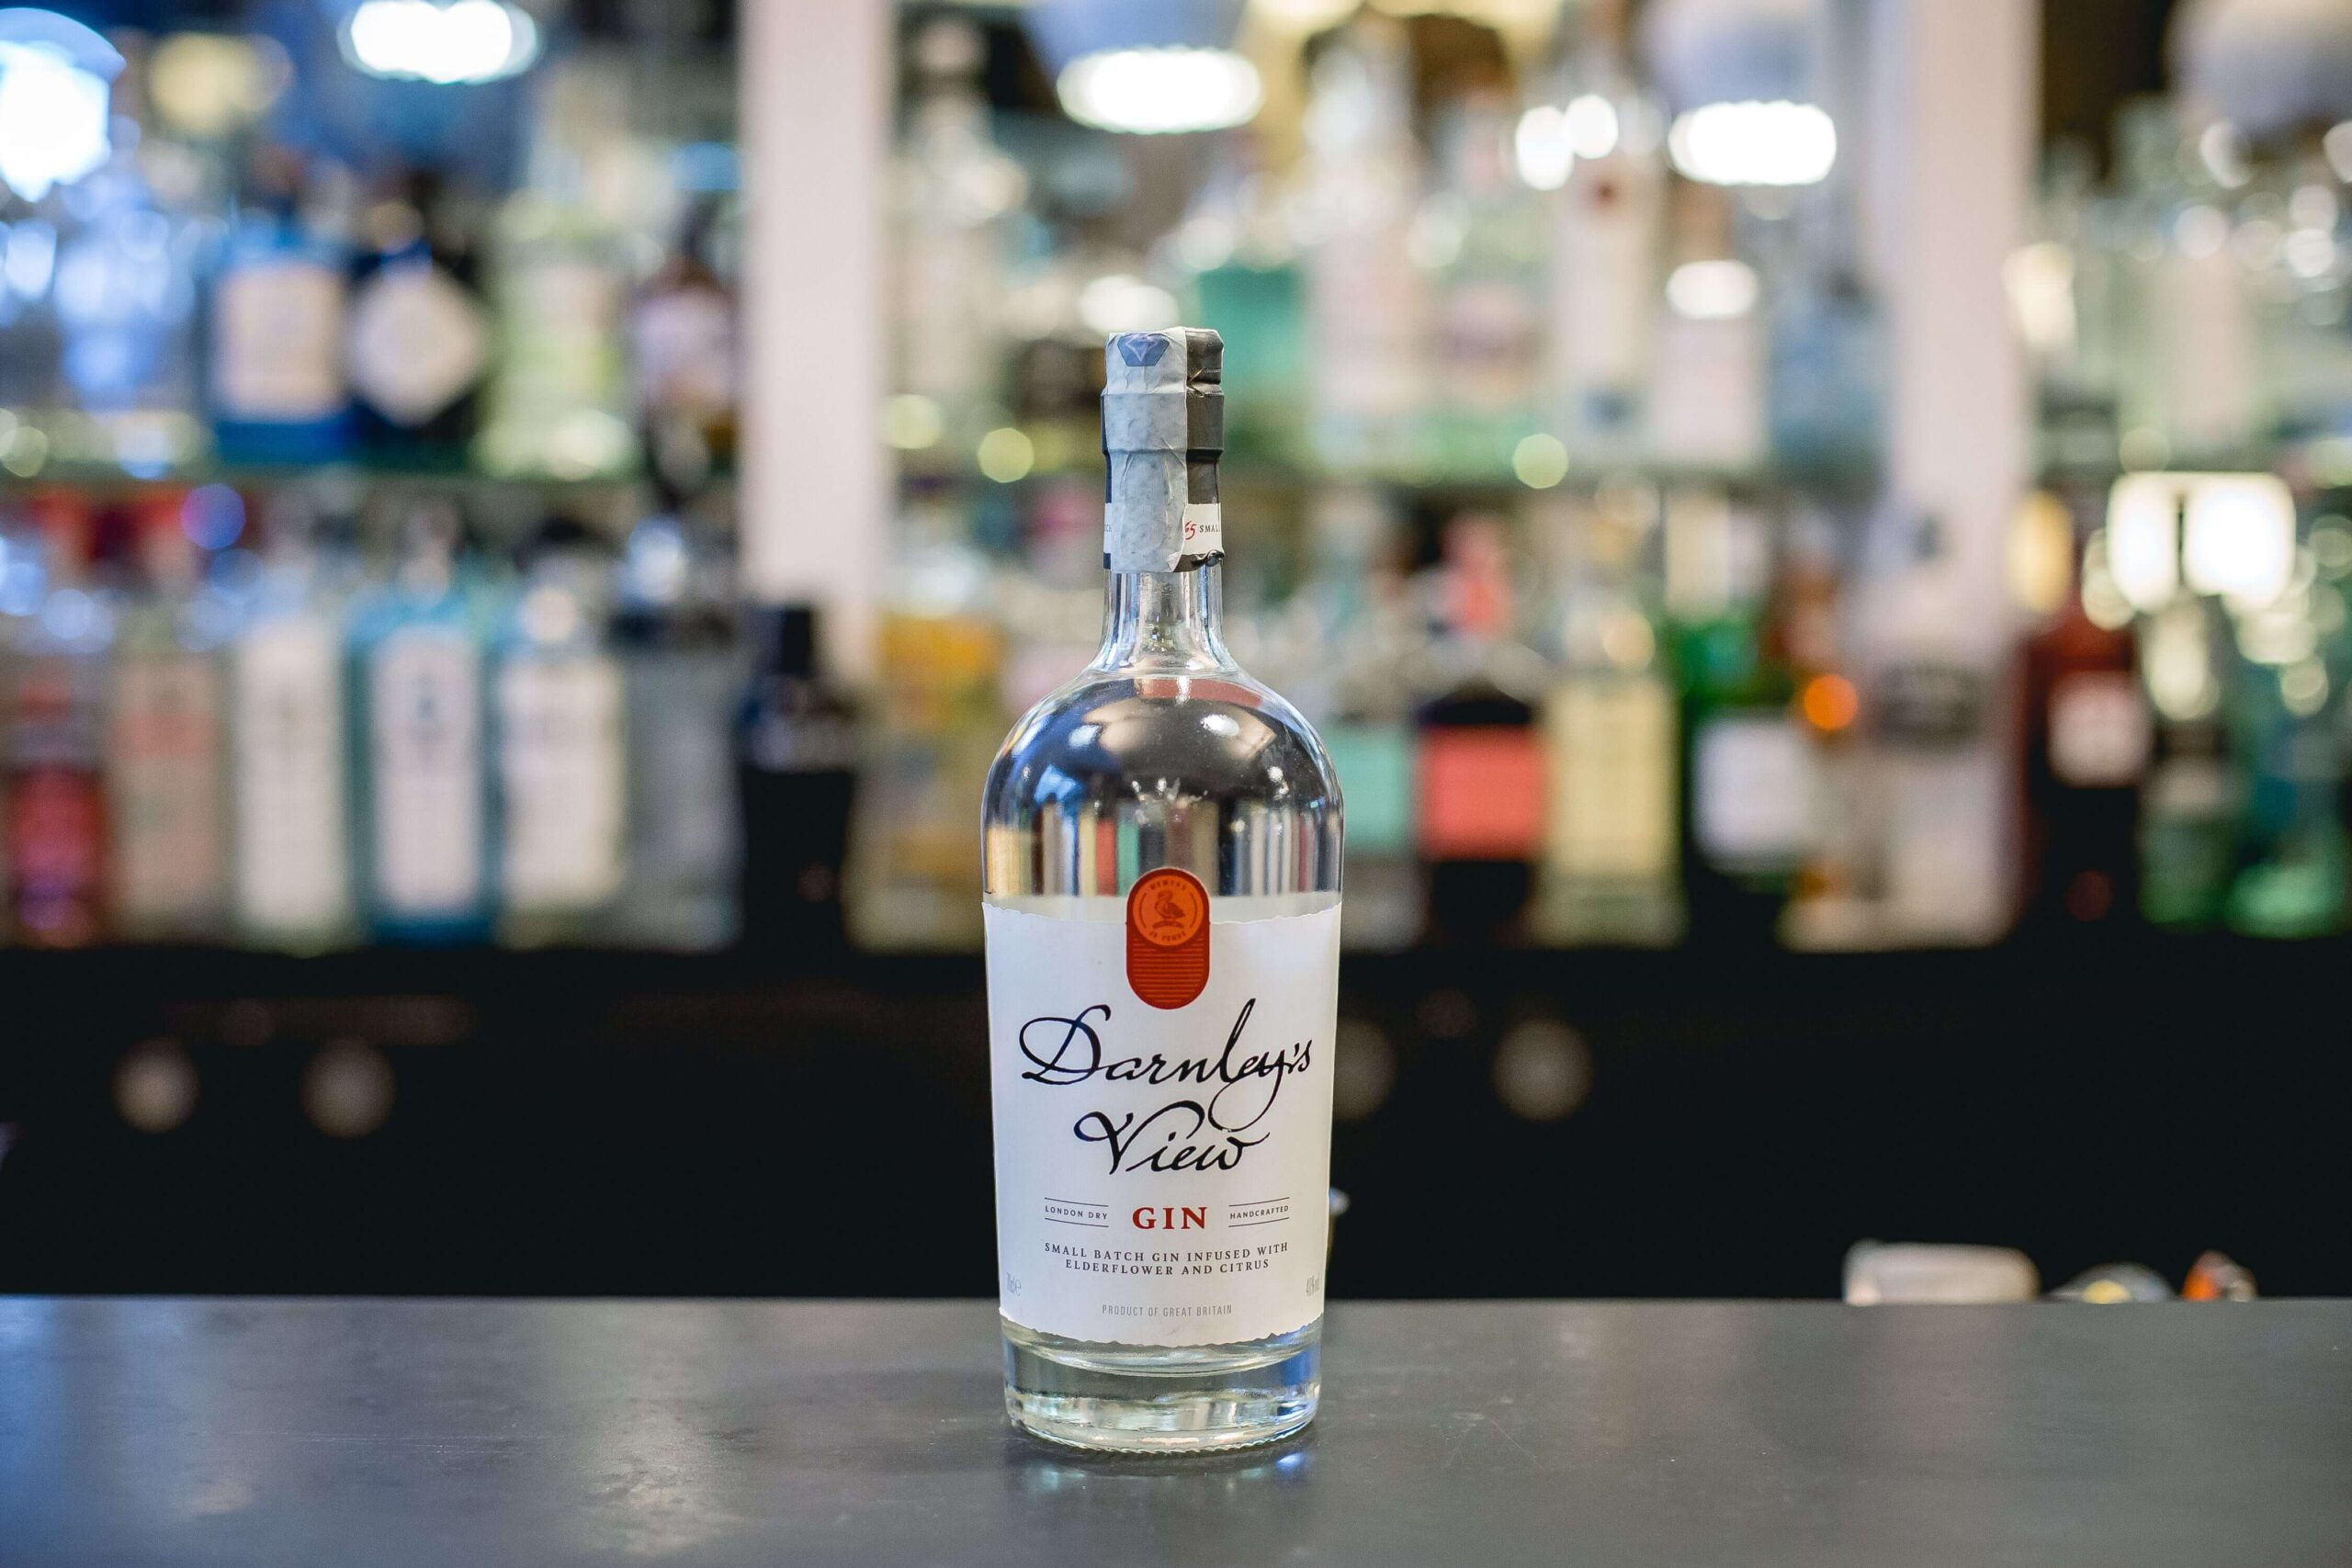 darnleys view gin